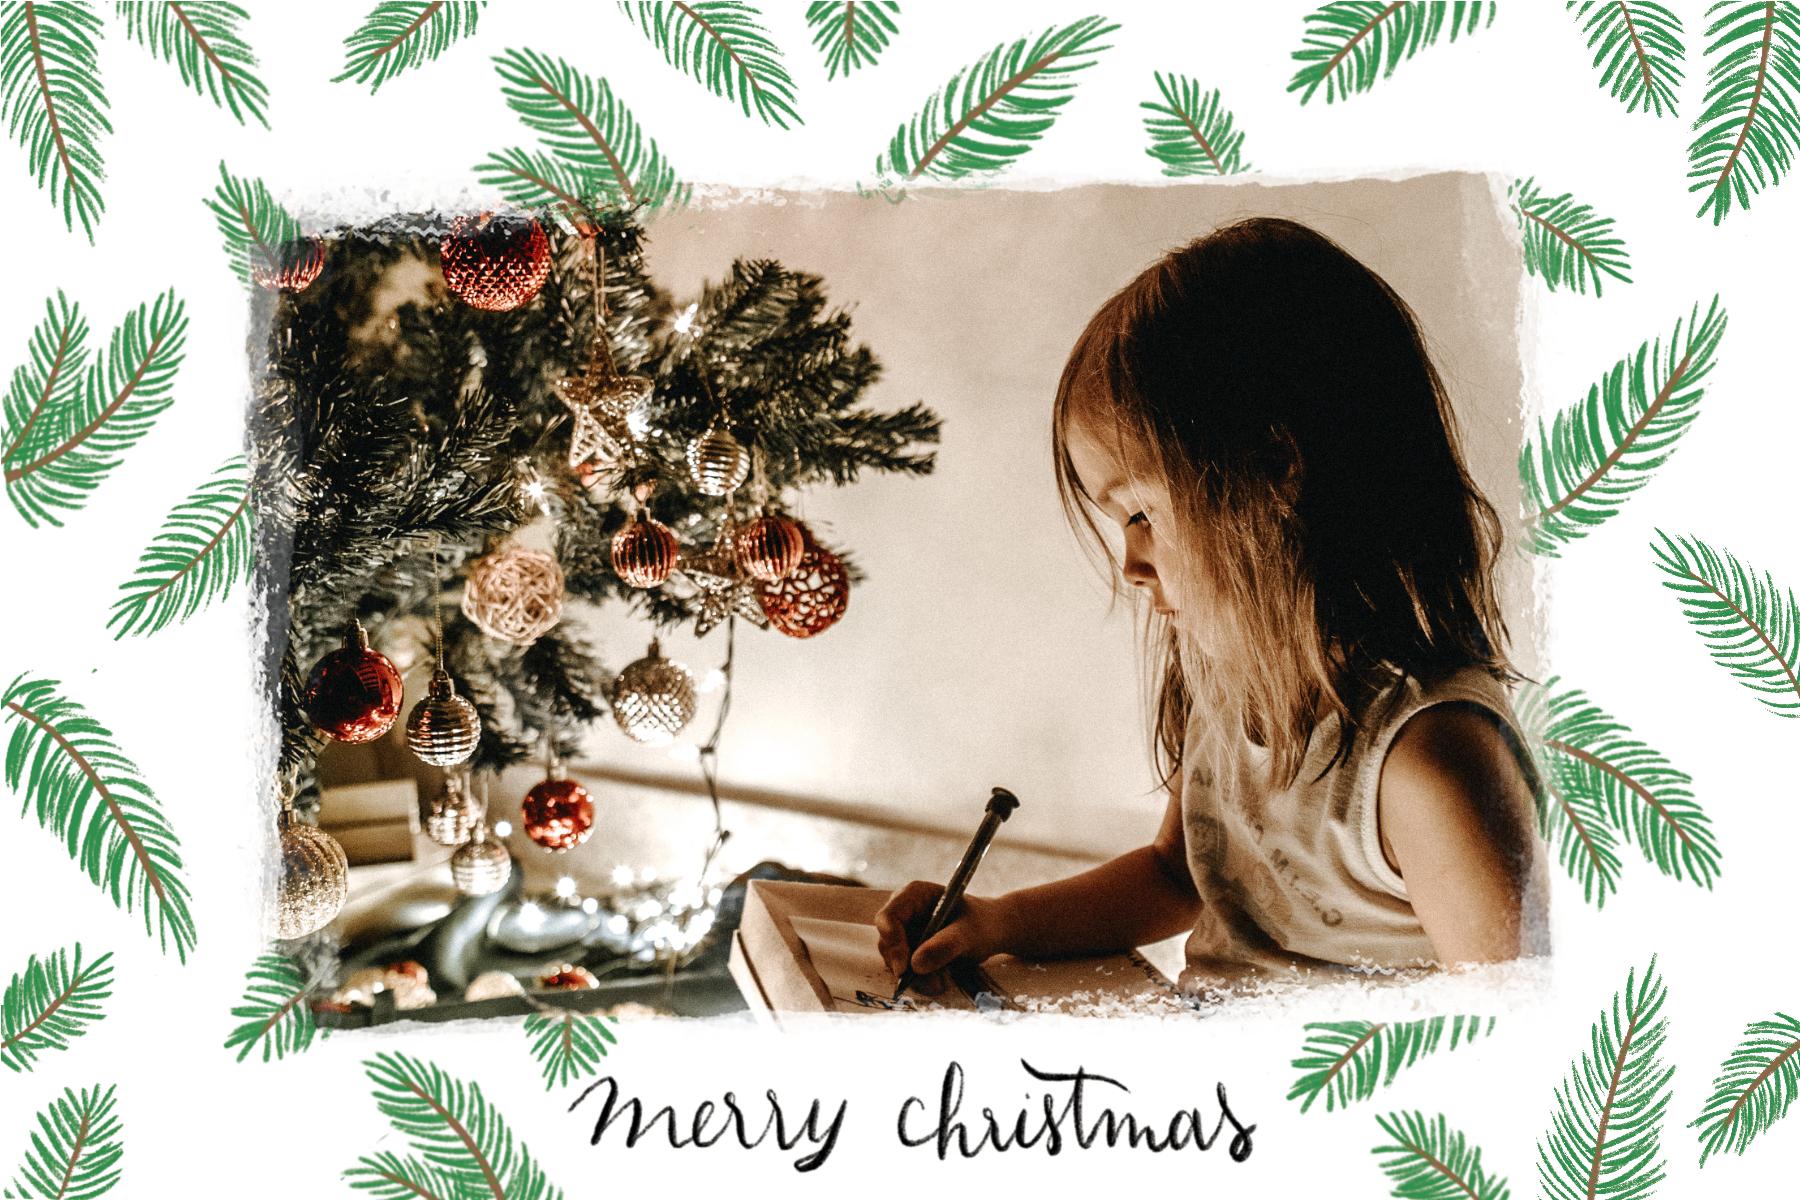 Carte Joyeux Noel avec branches de sapin